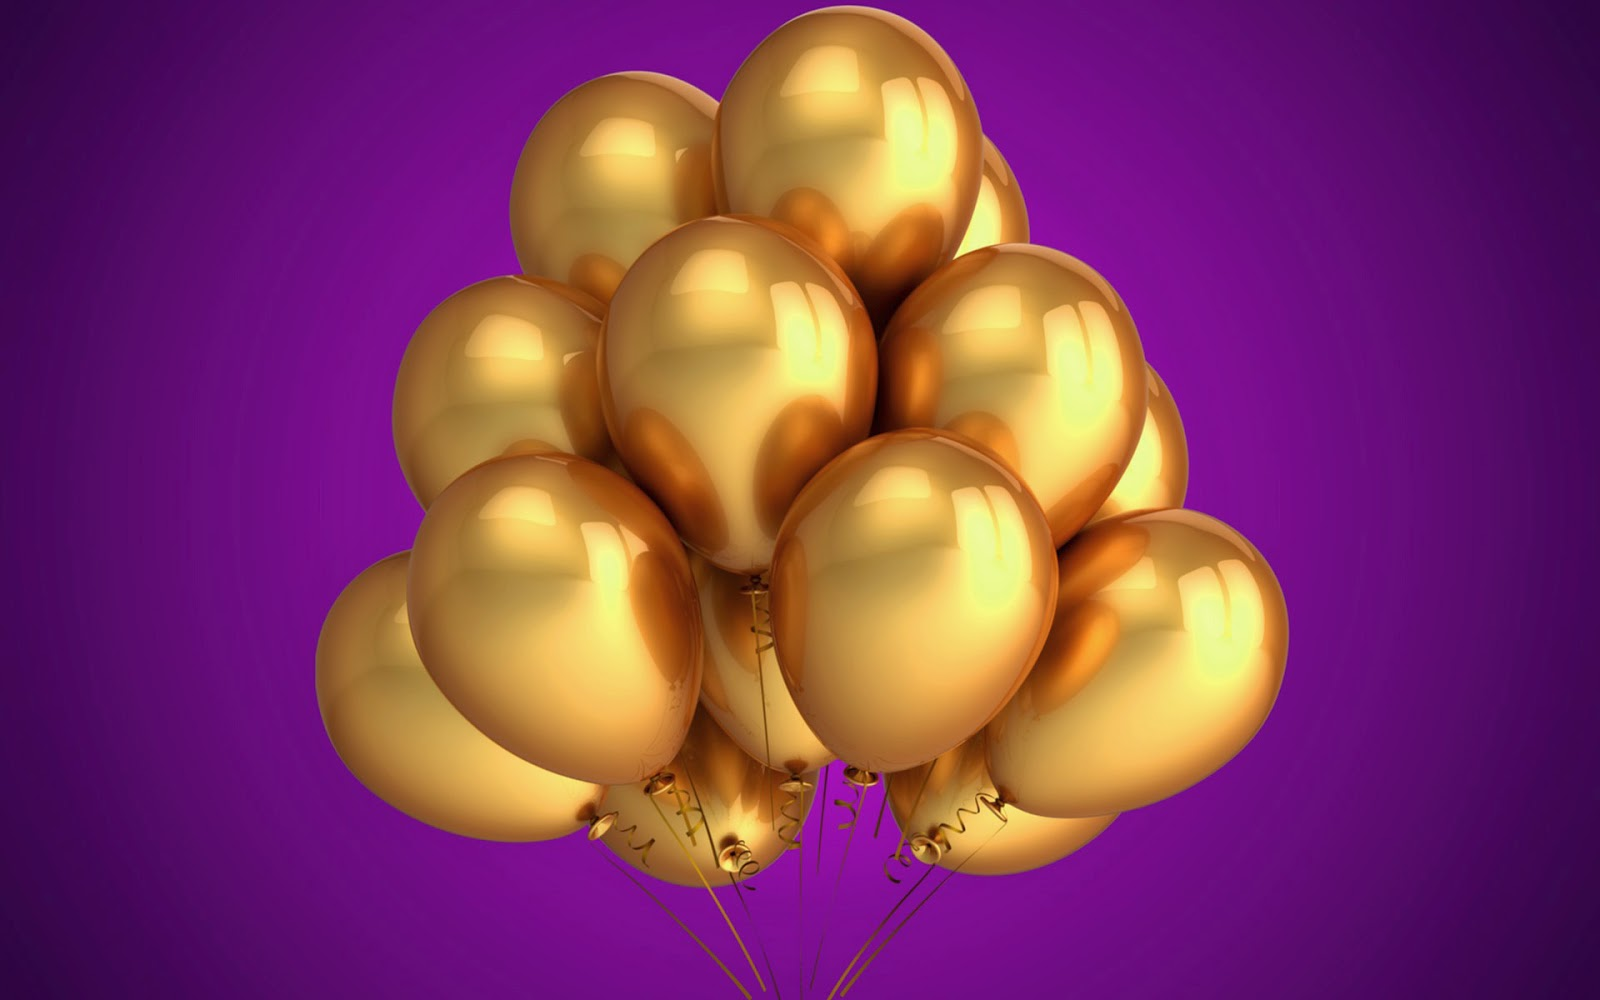 Gouden verjaardagsballonnen